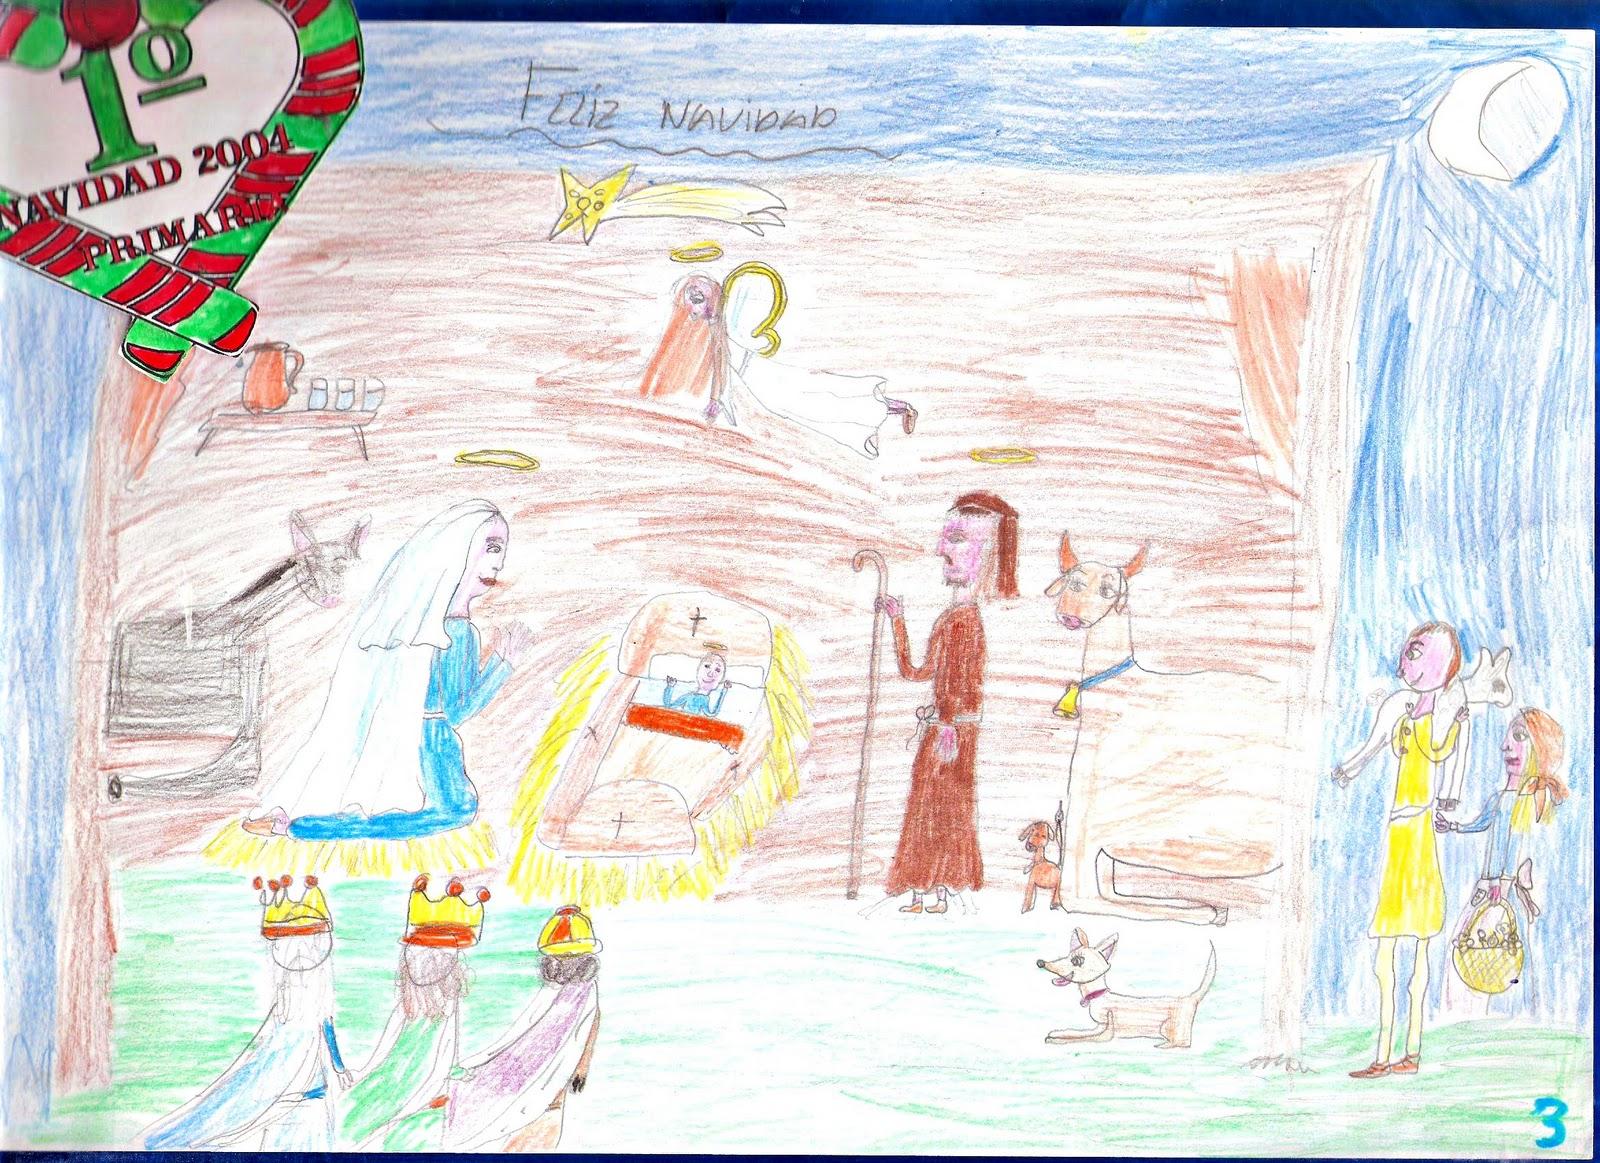 Dibujos Christmas Stunning Find This Pin And More On Dibujos  ~ Crismas De Navidad Hechos Por  Ninos